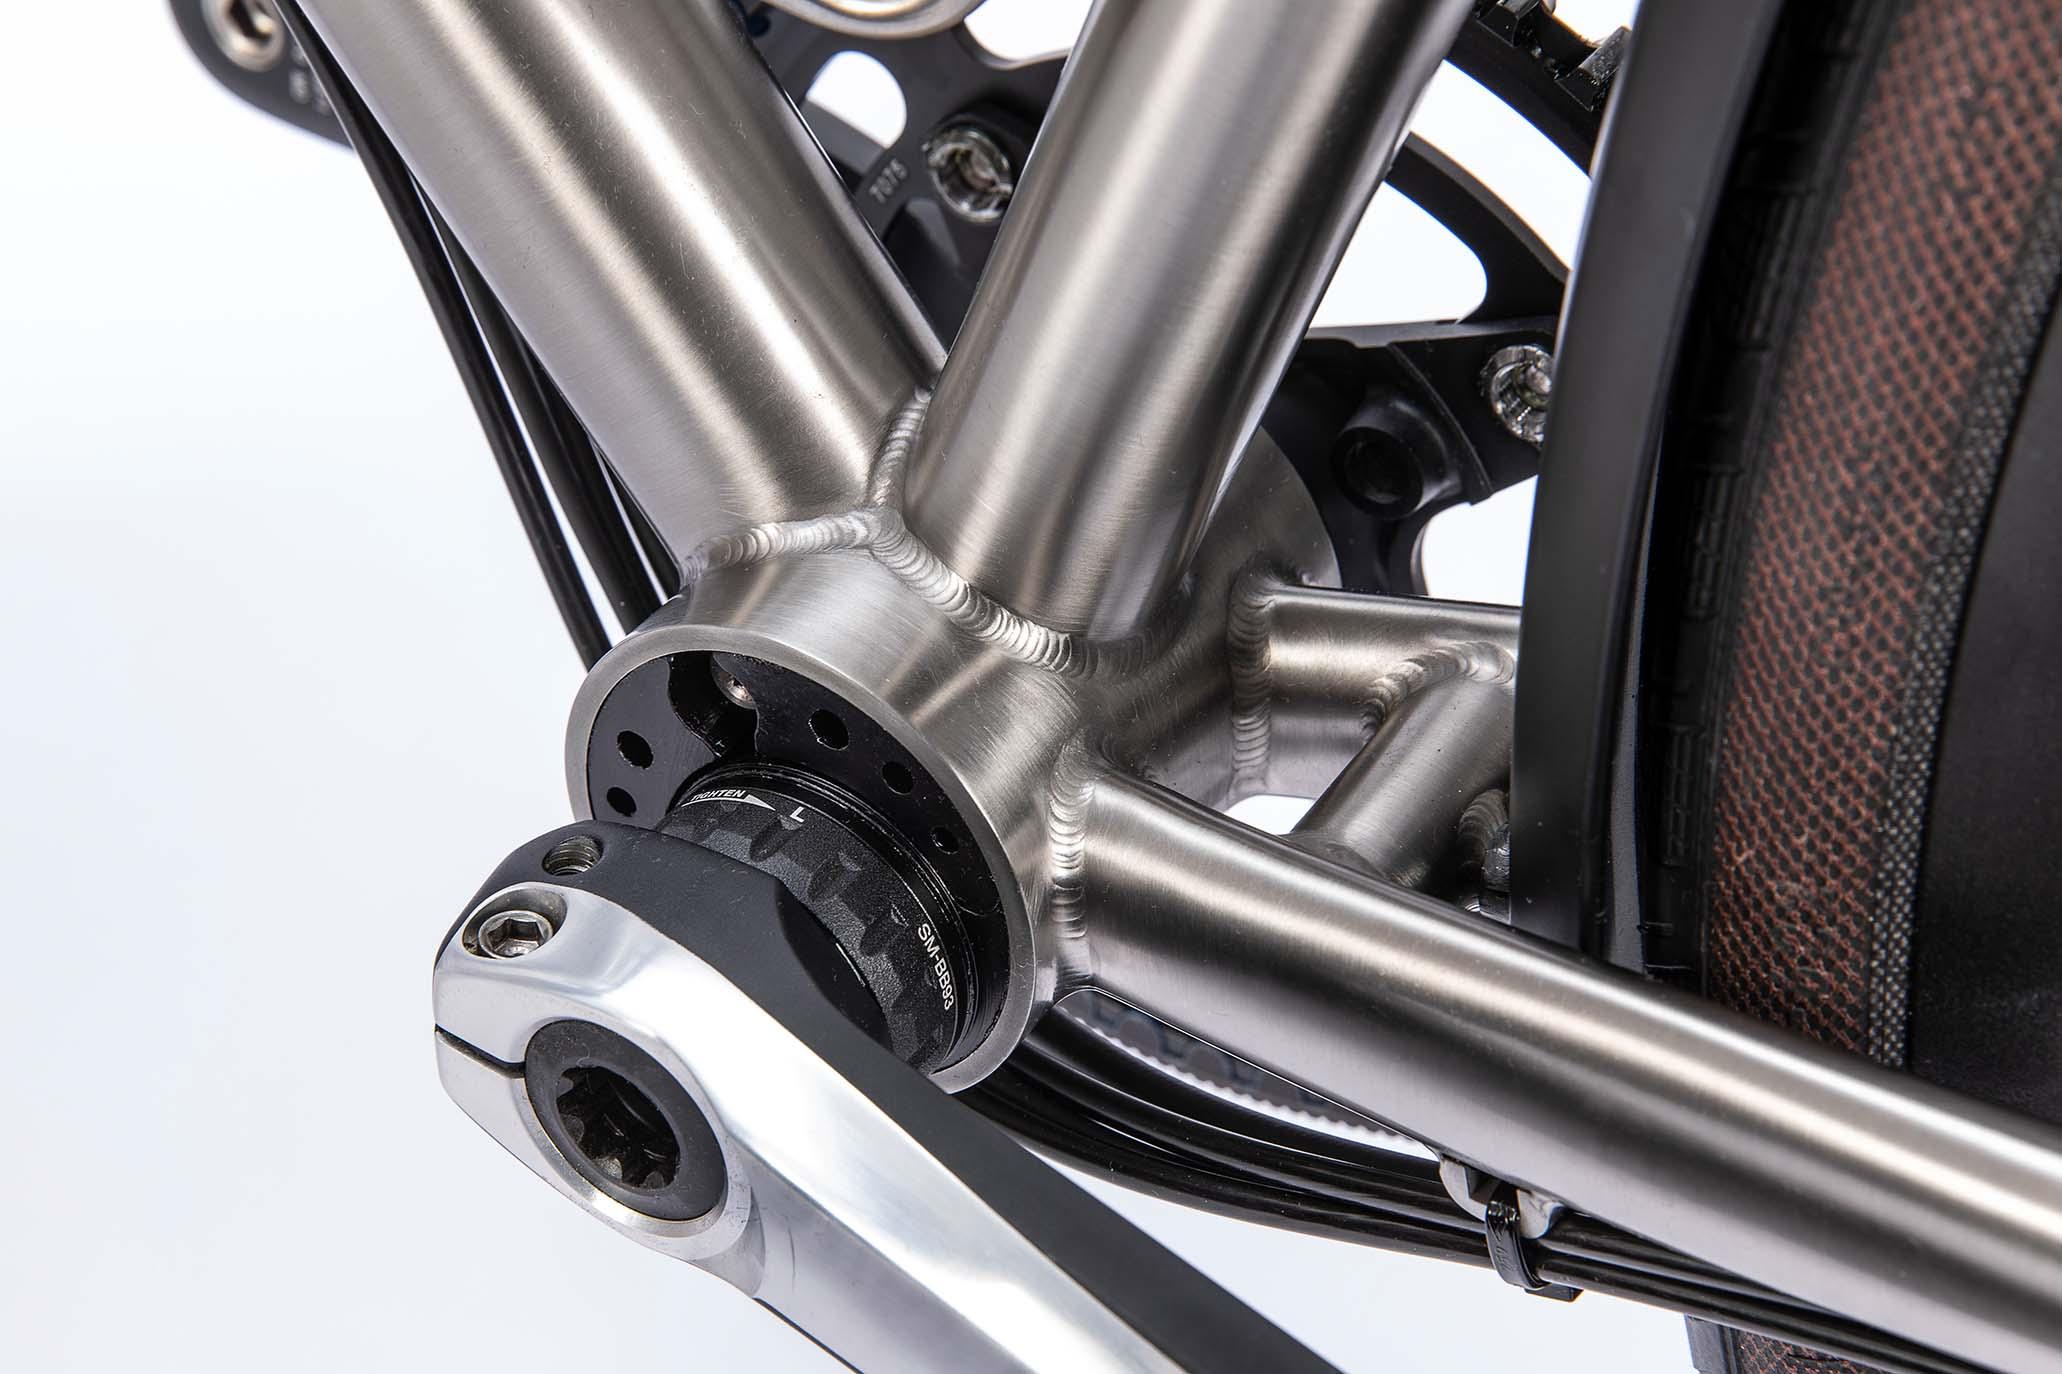 Rohloff Randonneur & Gravel Titan Fahrrad_6